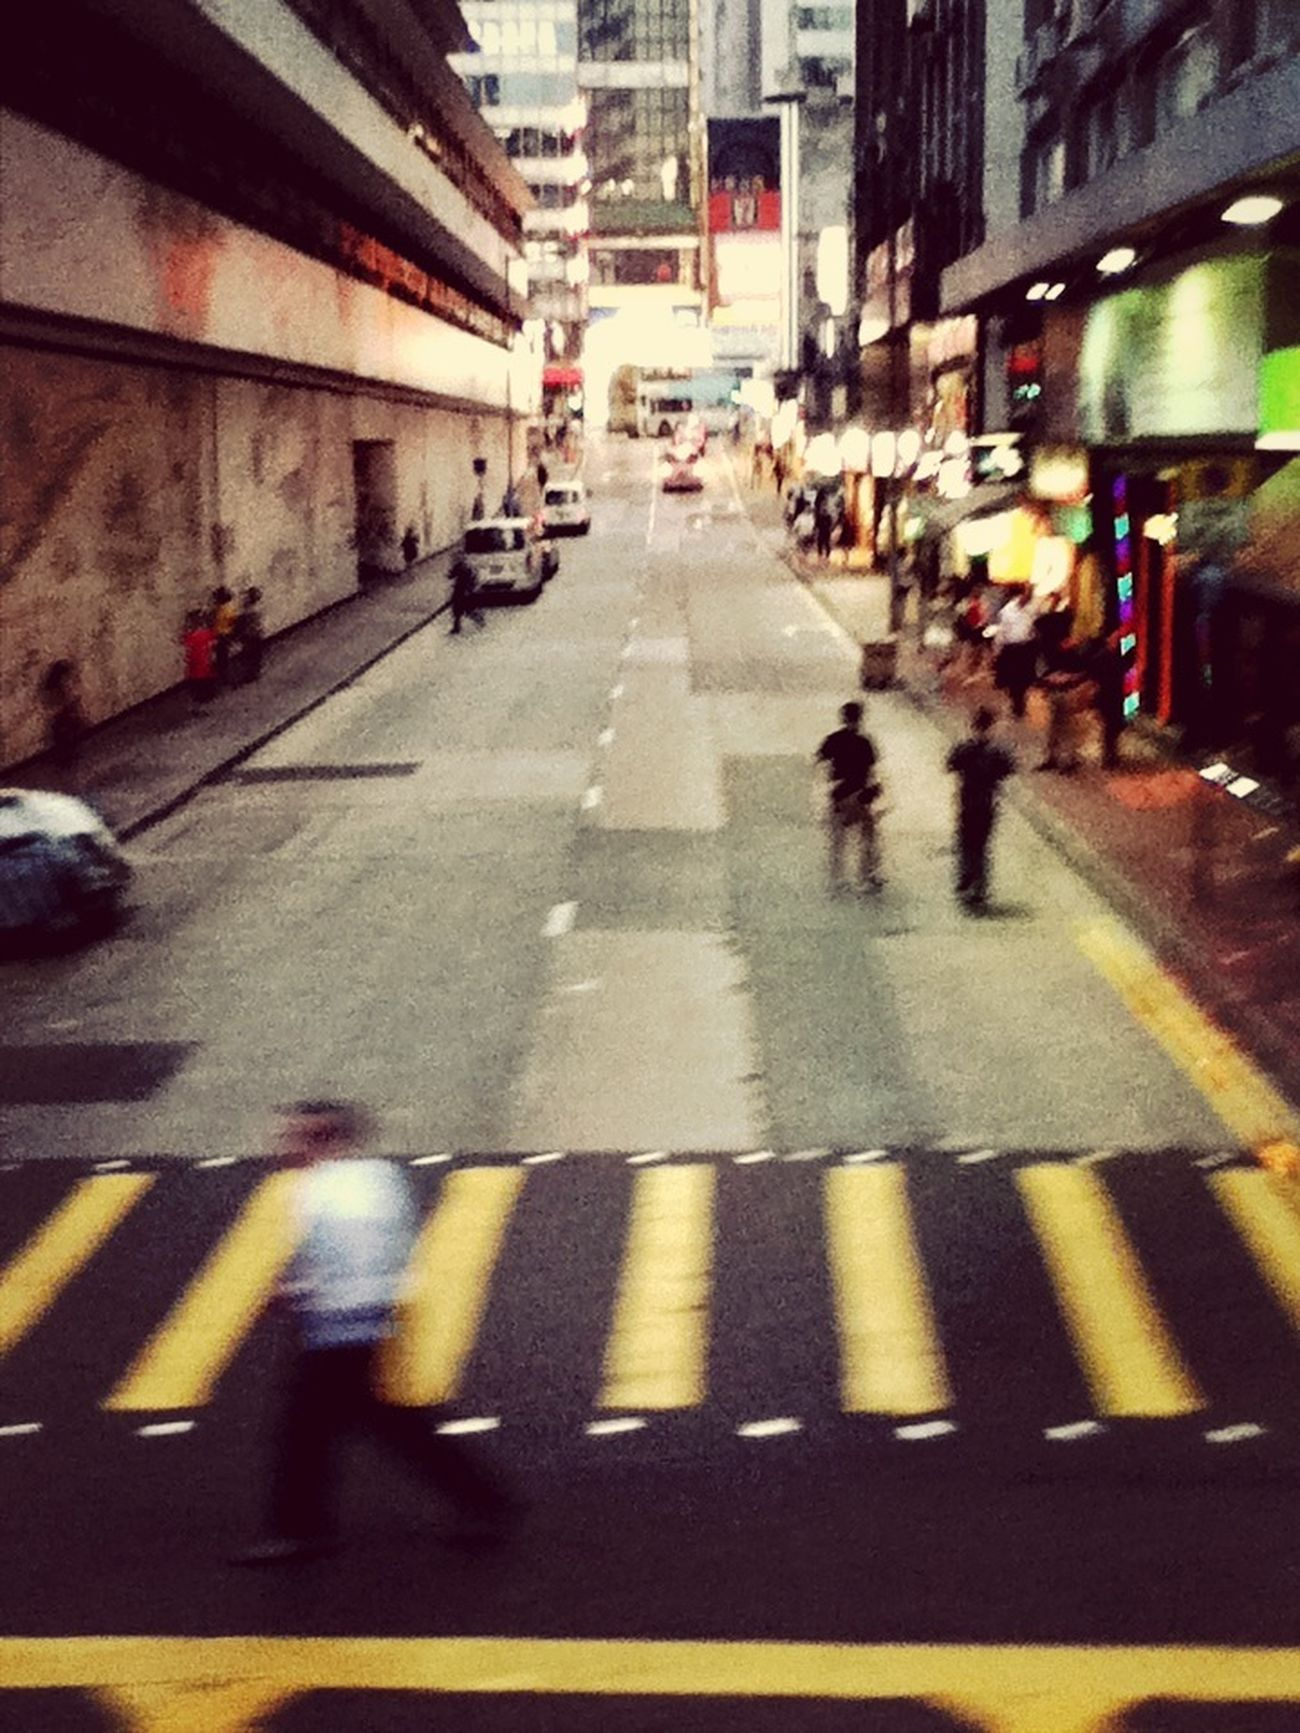 Urban Emma-You hong kong-central City 1830-1900